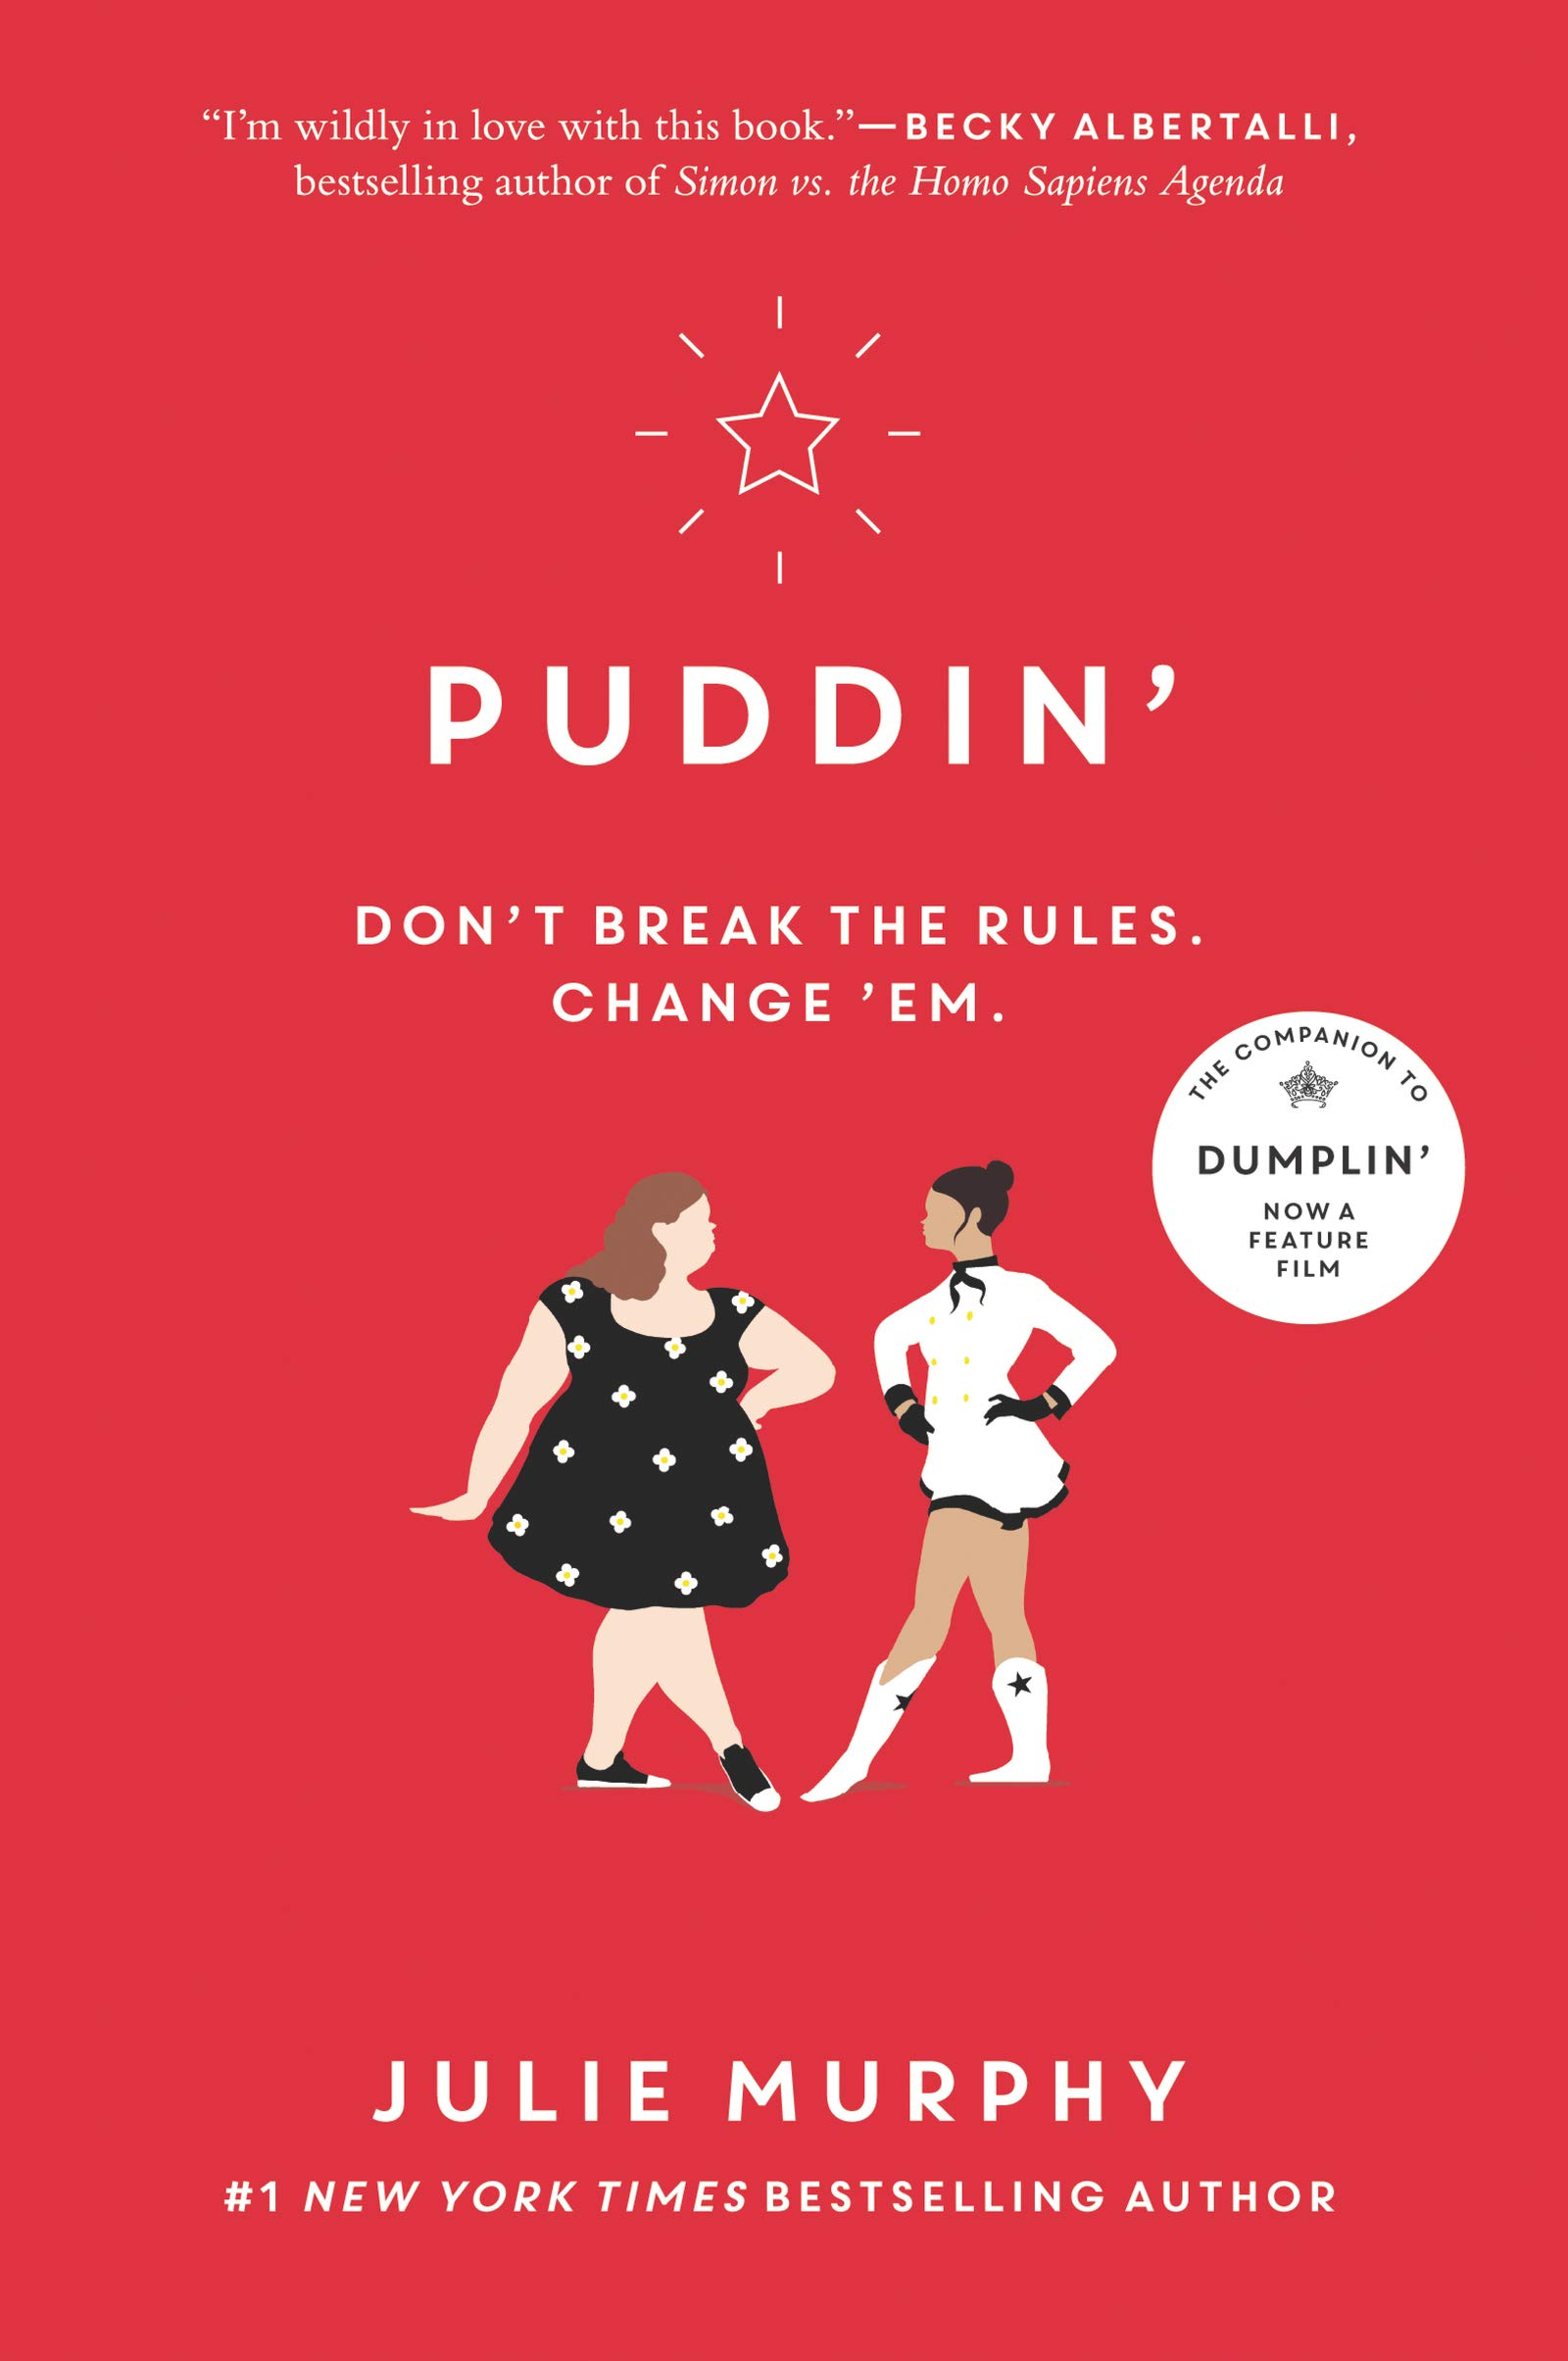 Puddin Dumplin Julie Murphy product image